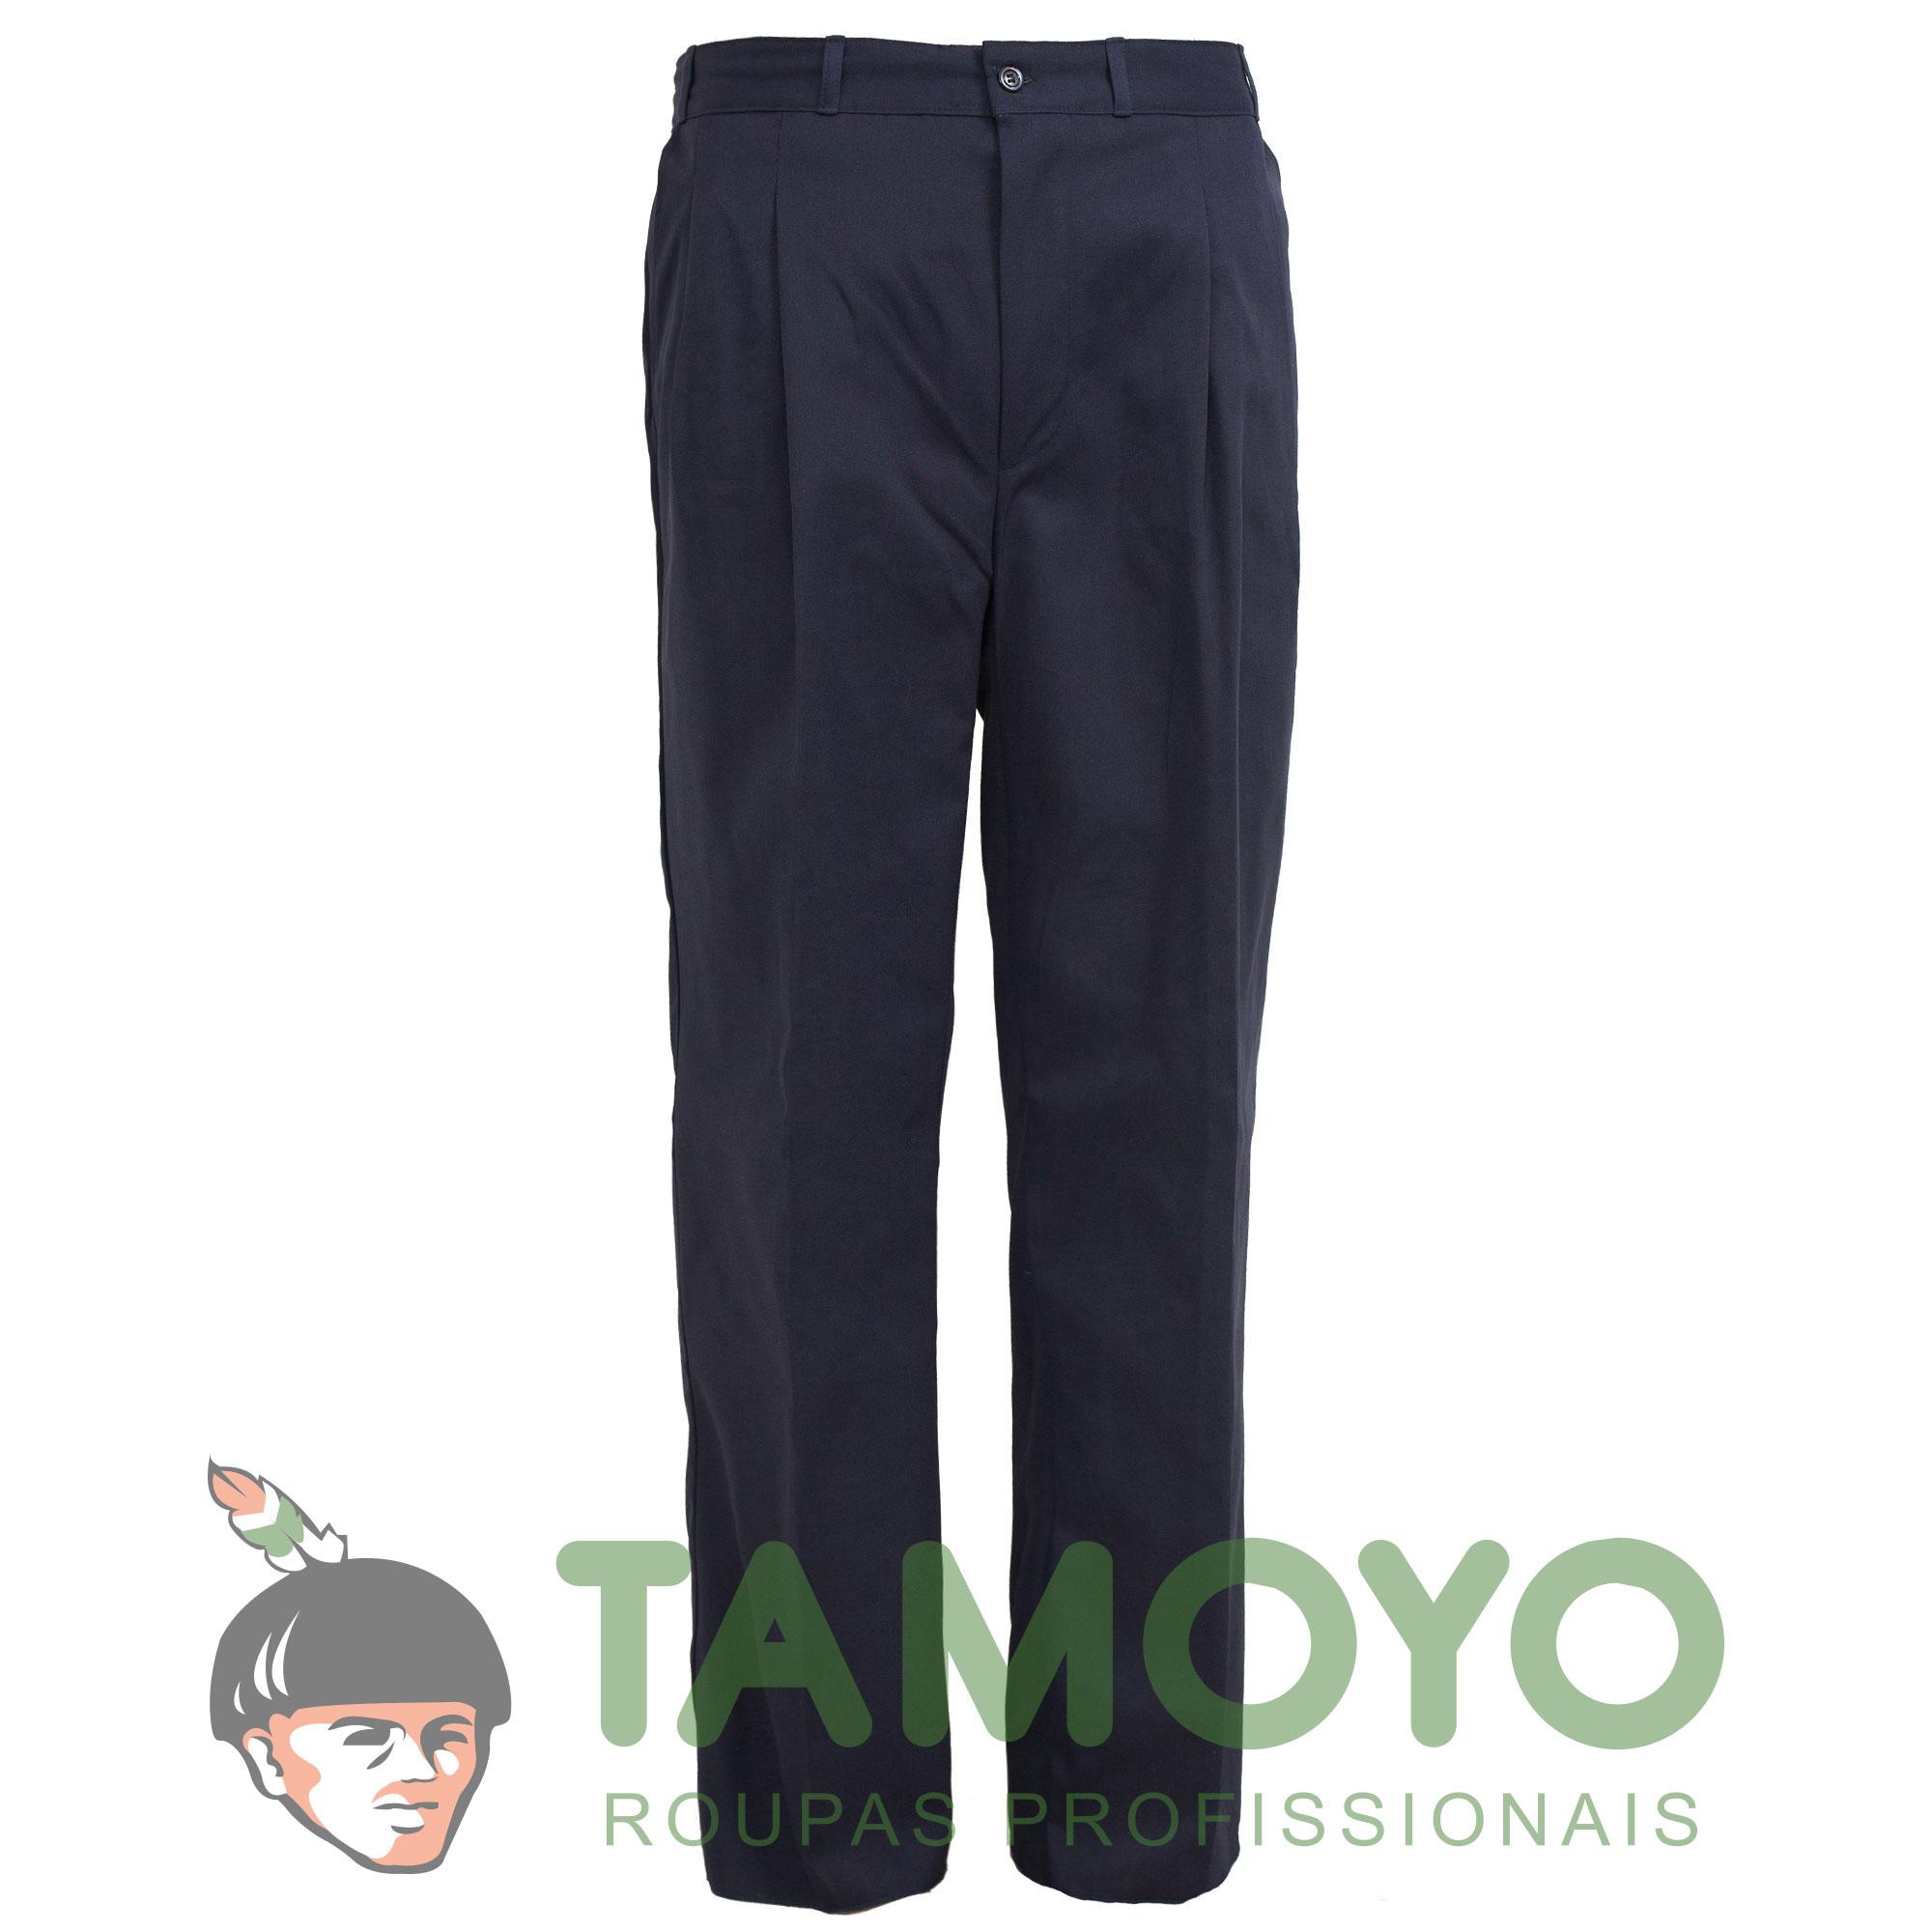 rede-postos-combustivel-roupas-tamoyo-calca-promotor-frente-2